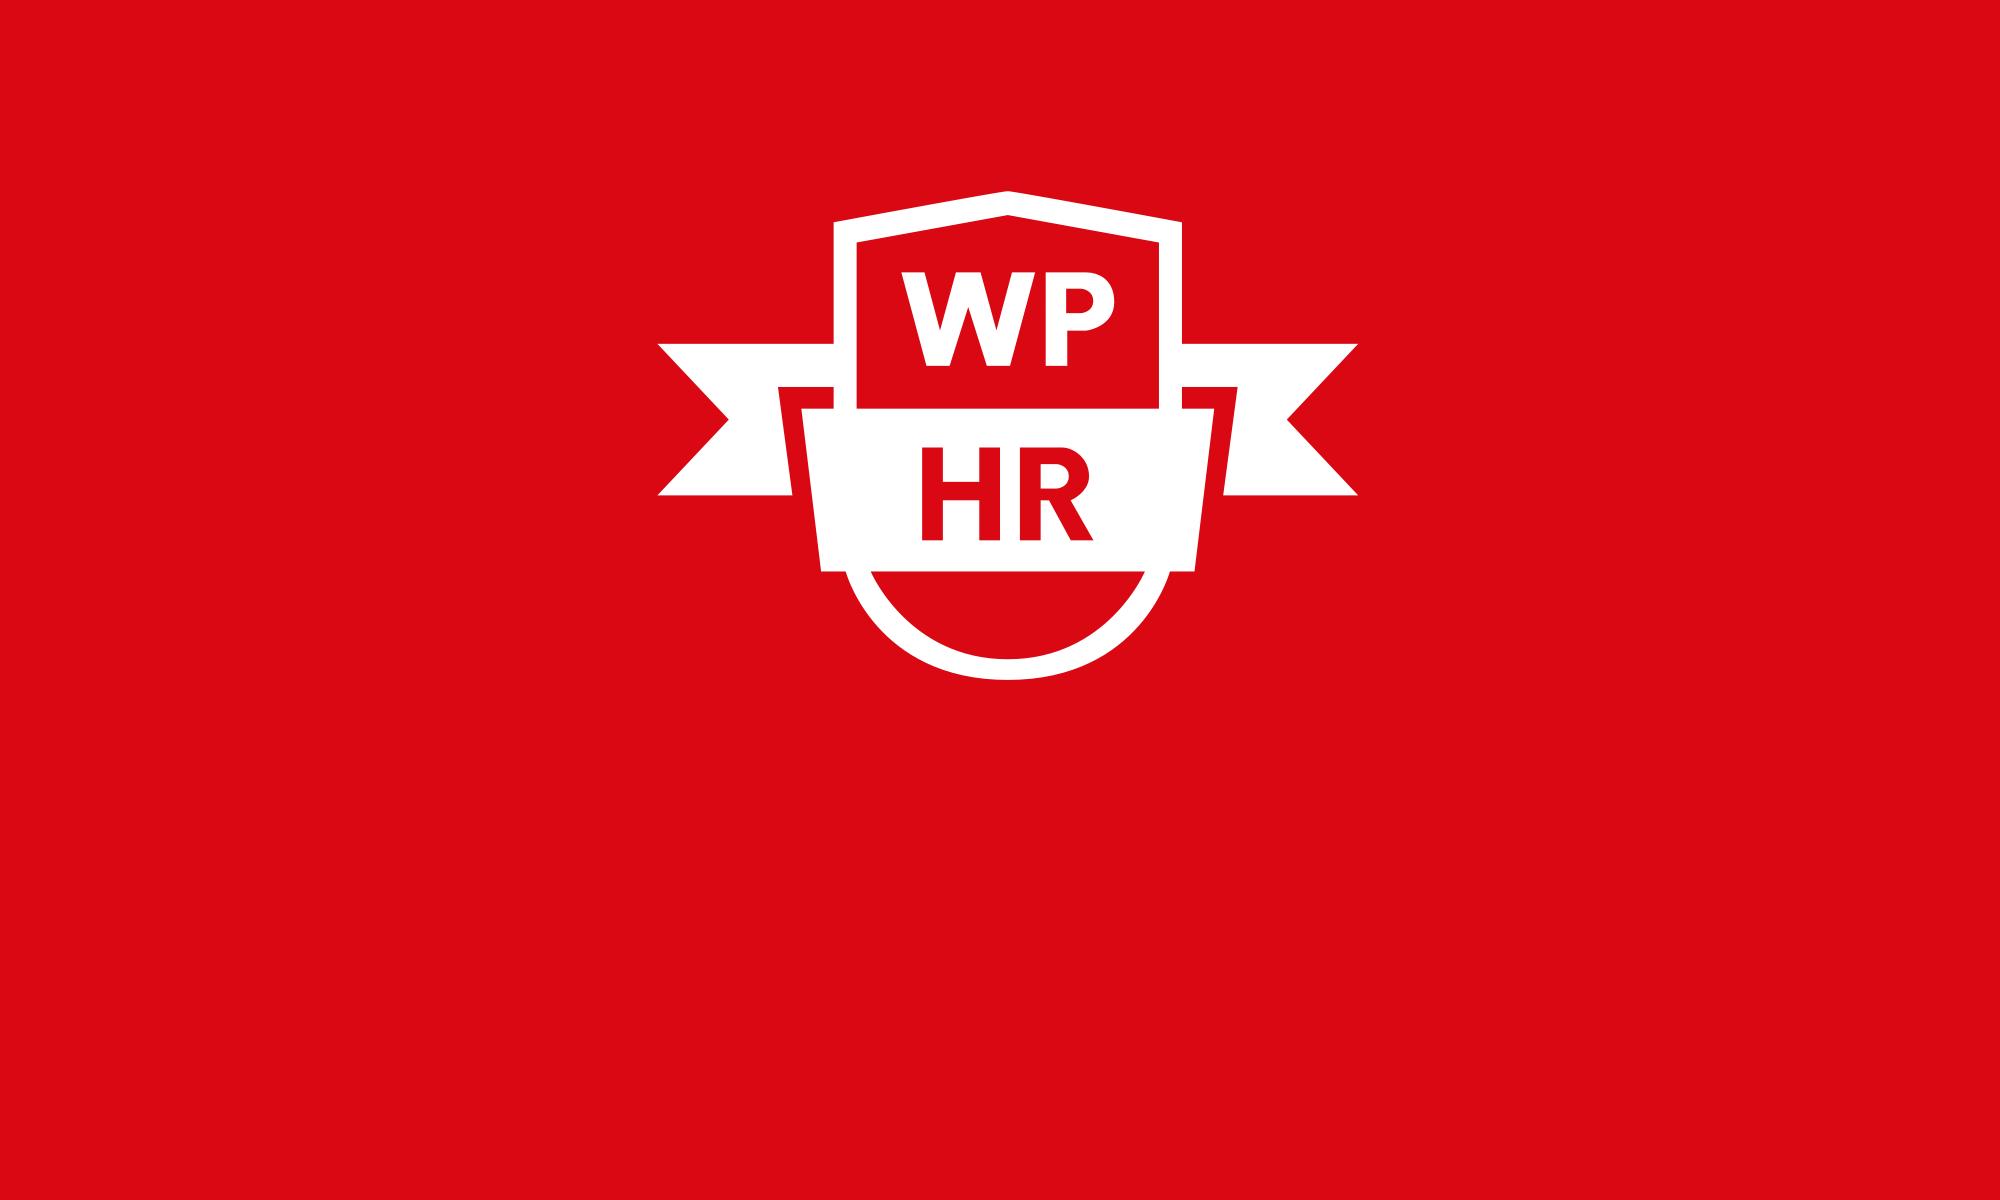 WordPress Hrvatska